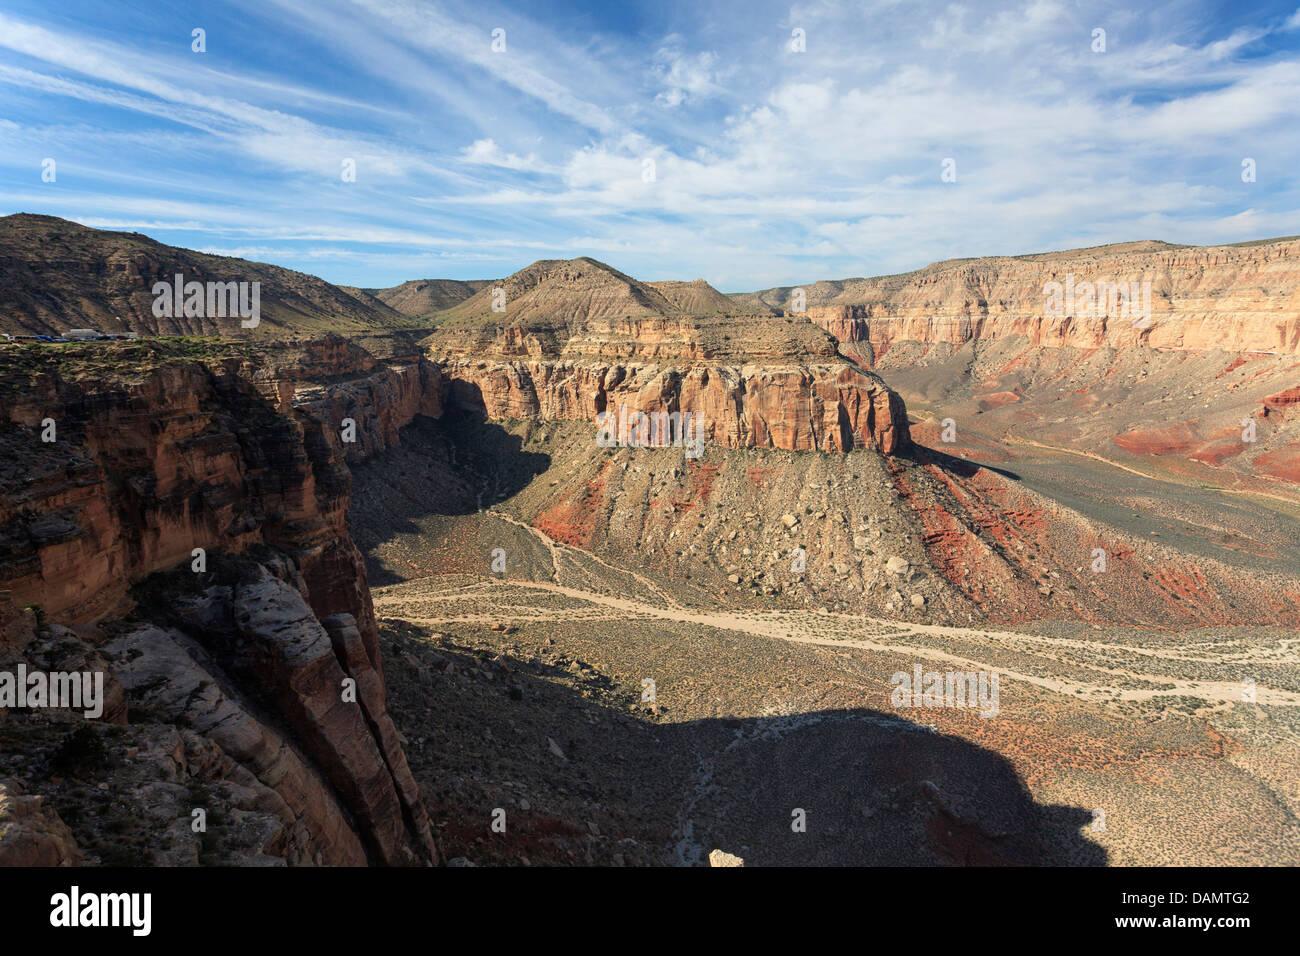 USA, Arizona, Gran Canyon, Havasu Canyon (Hualapai Reservation) - Stock Image